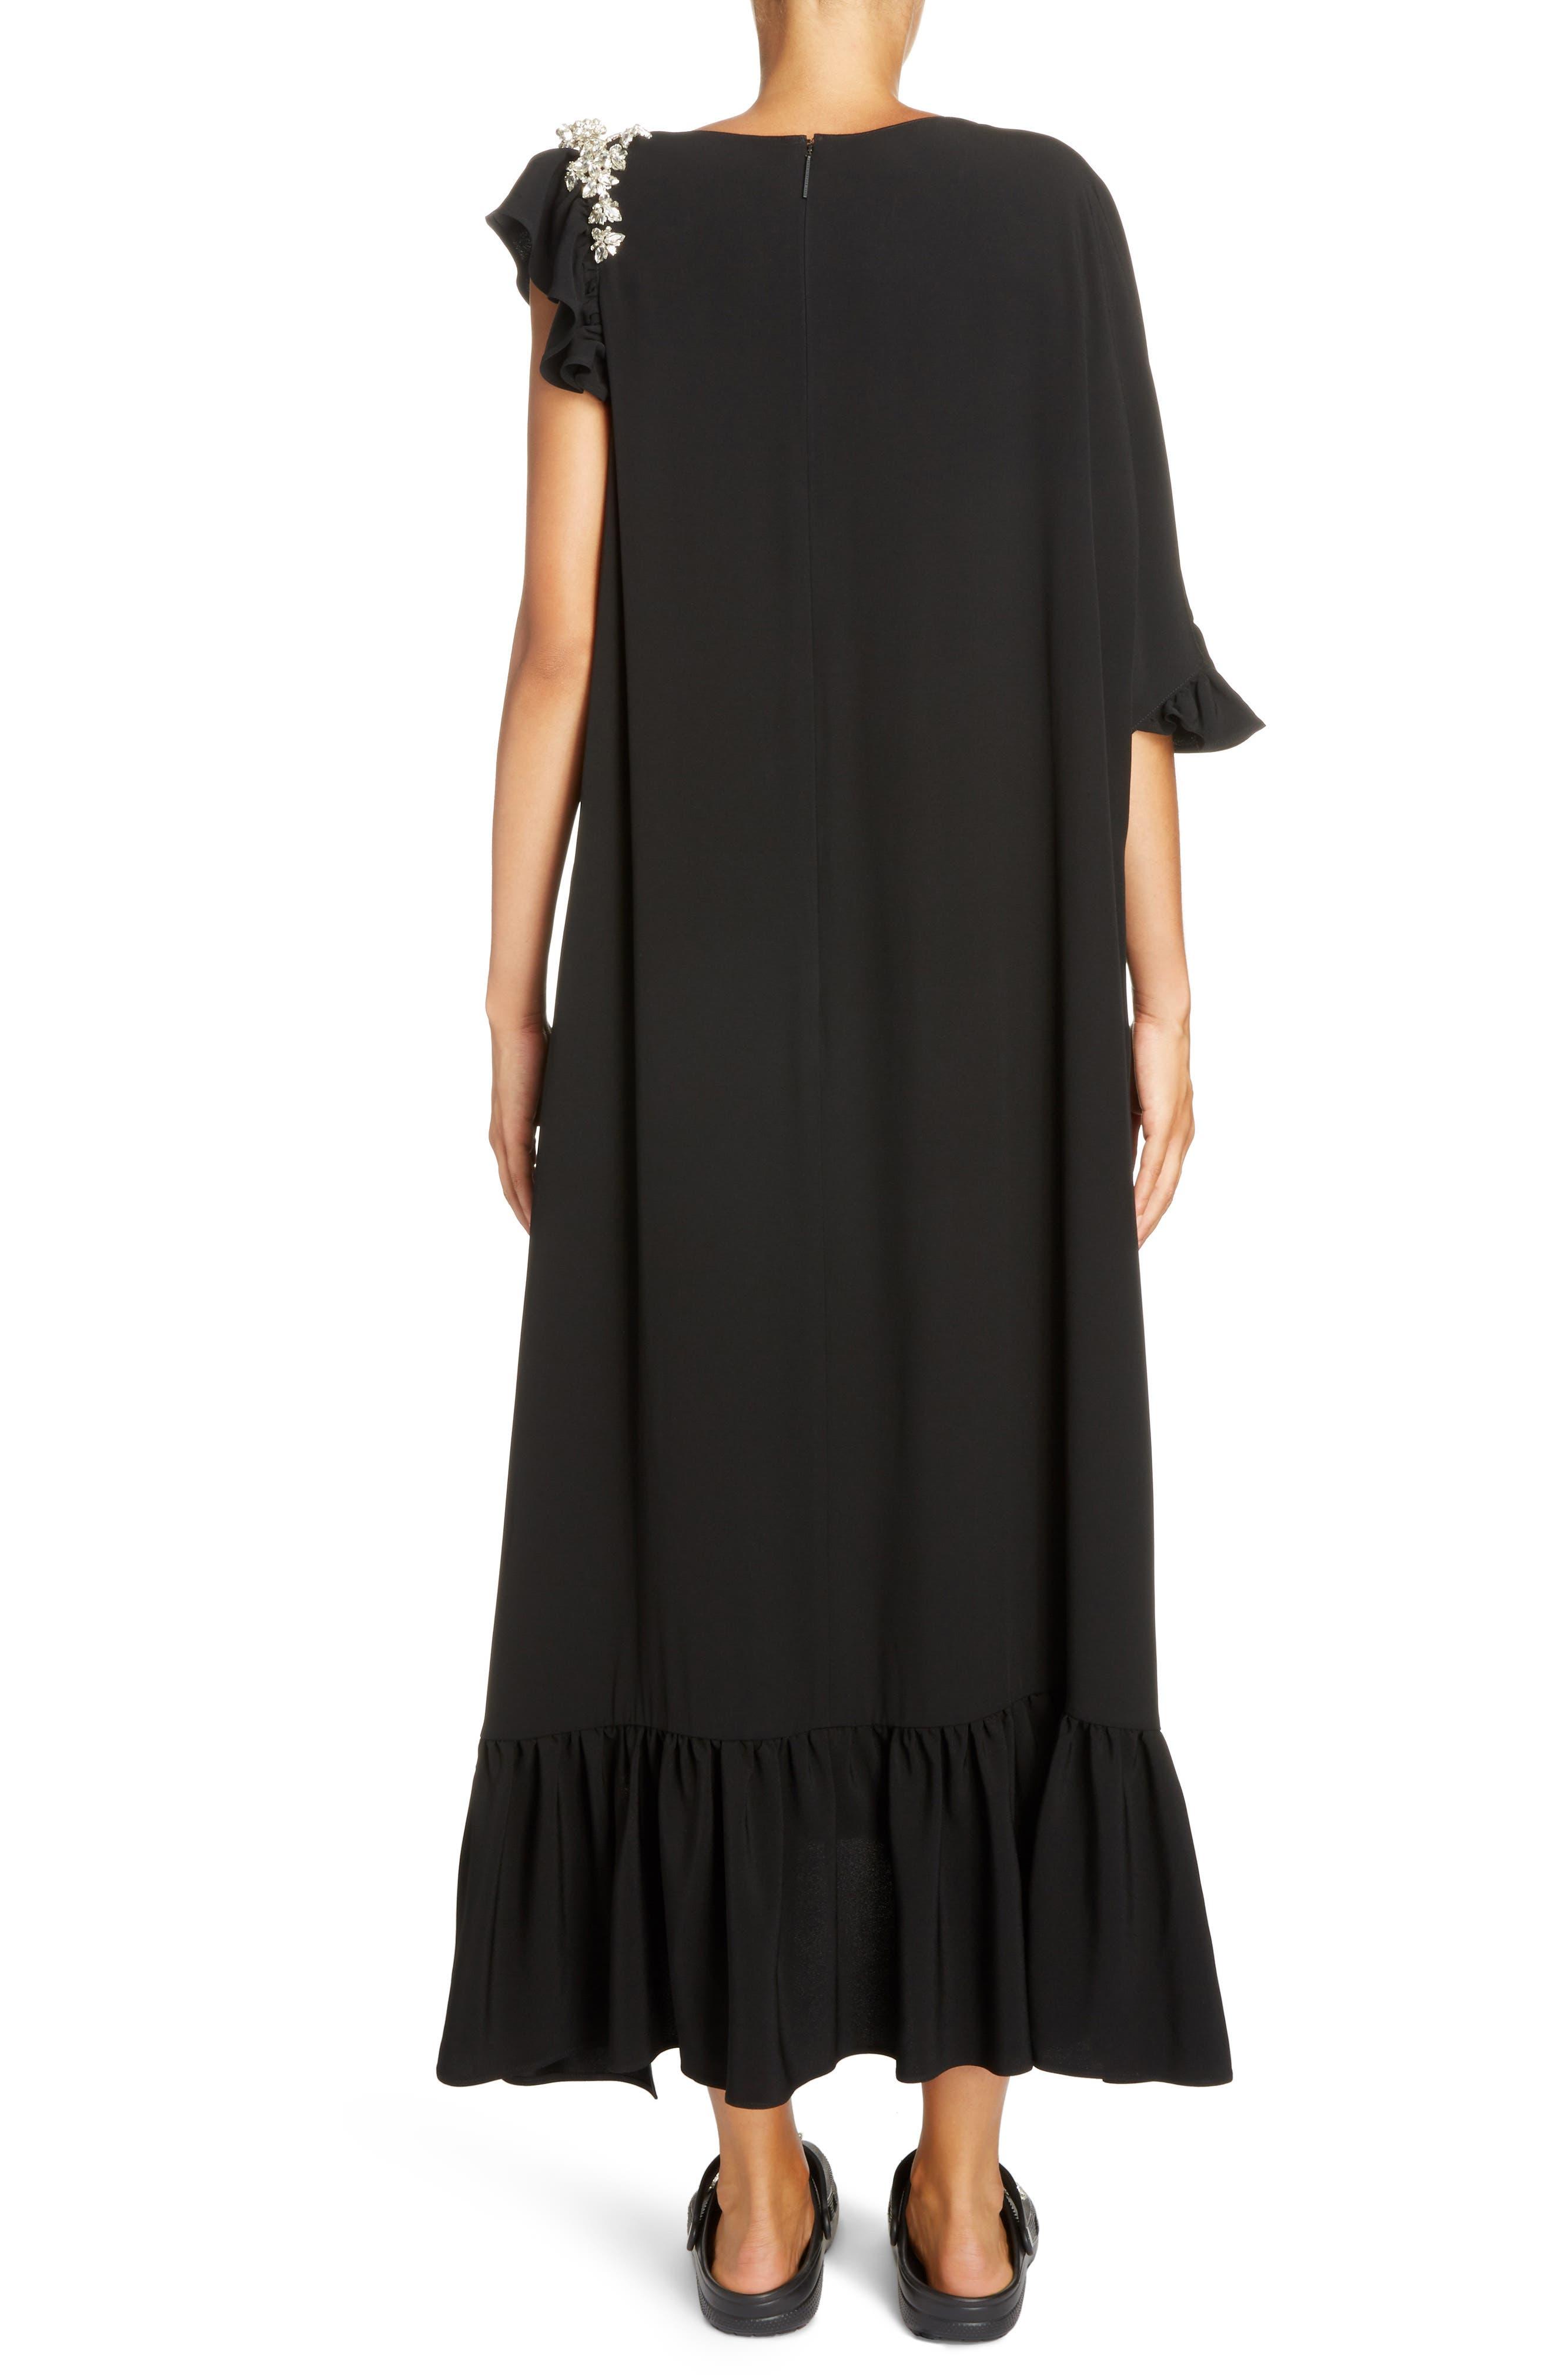 Crystal Embellished Frill Maxi Dress,                             Alternate thumbnail 2, color,                             Black